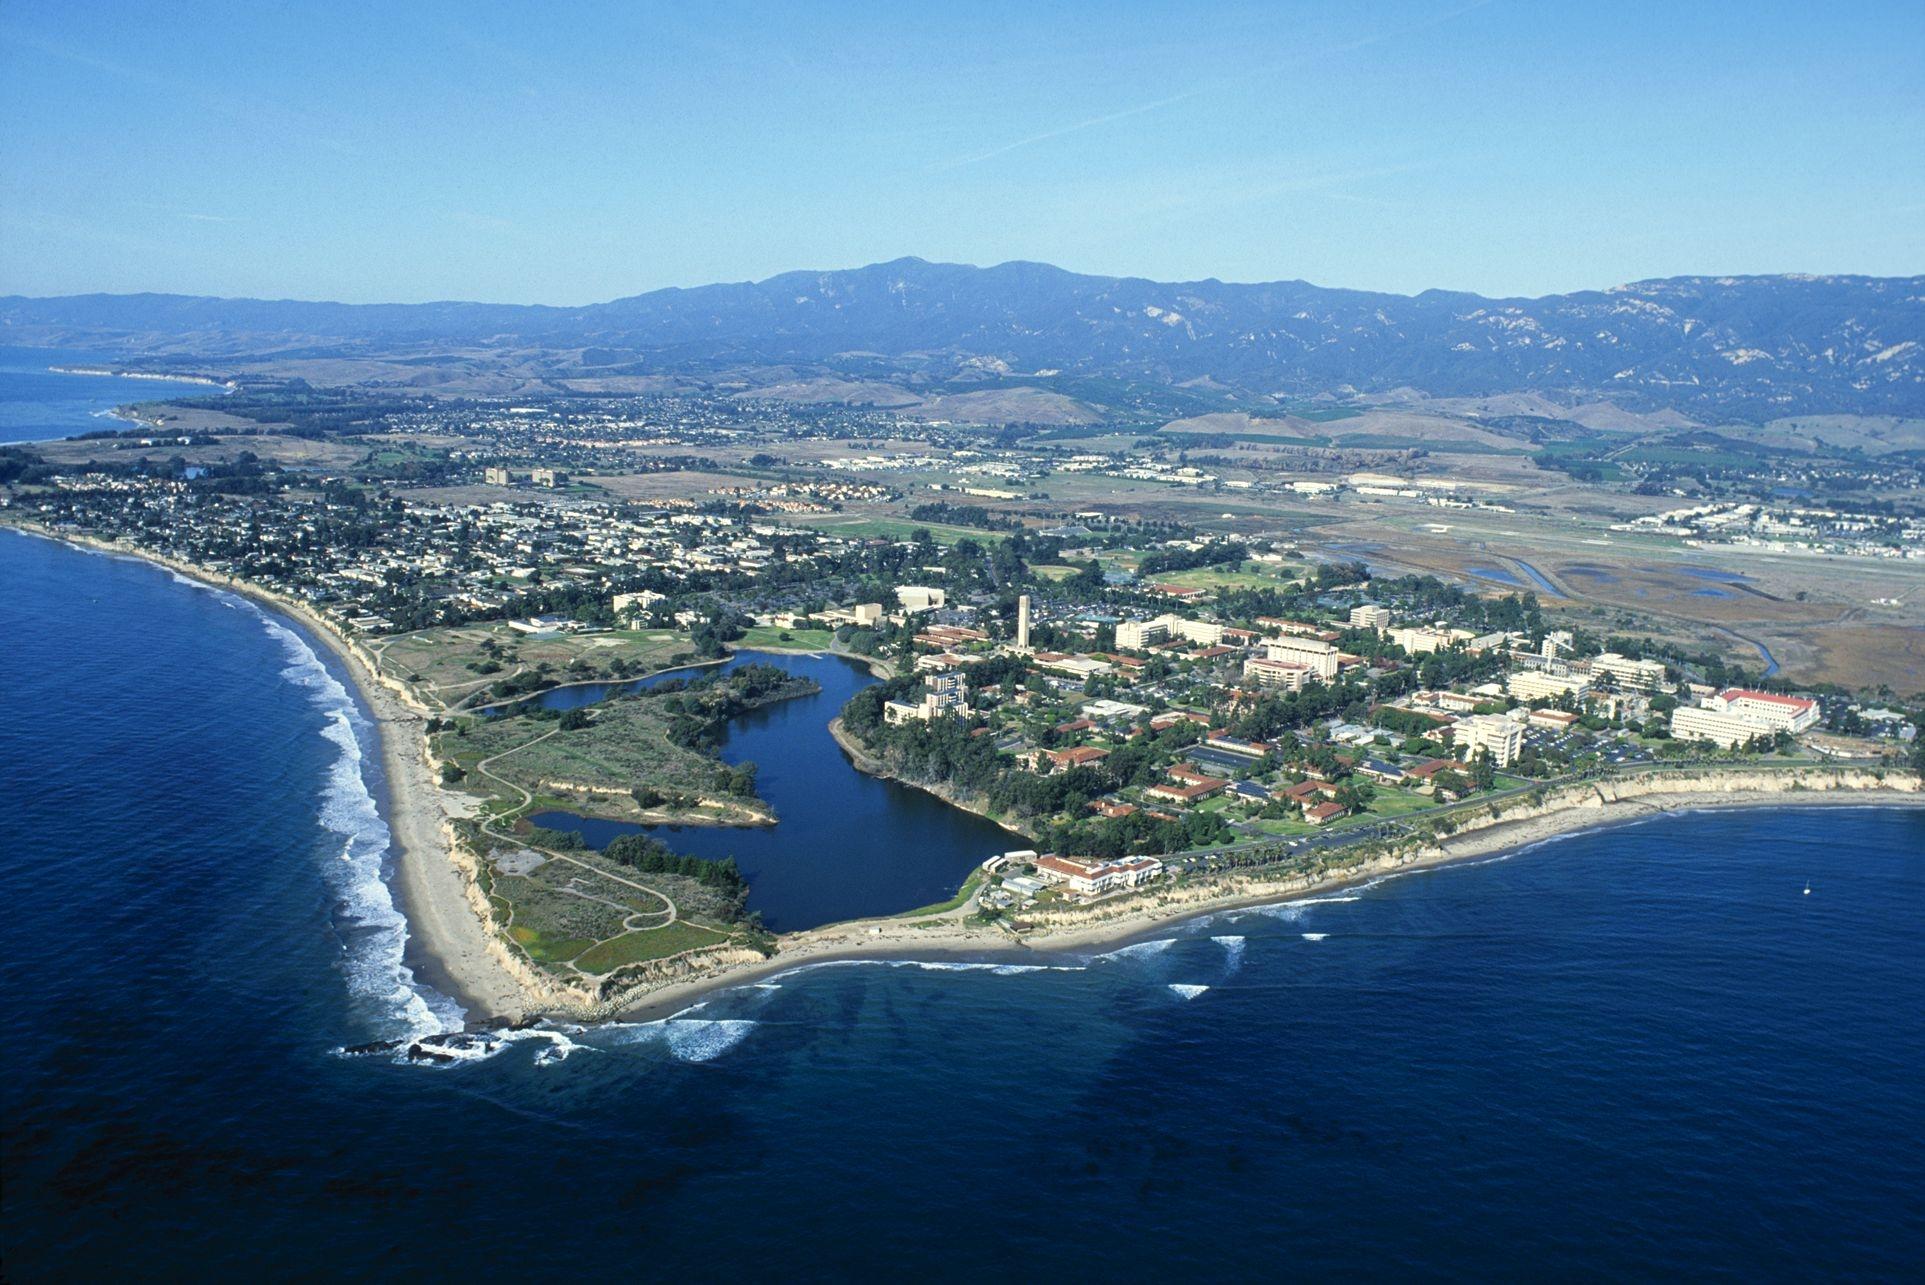 Santa Barbara Polo Club